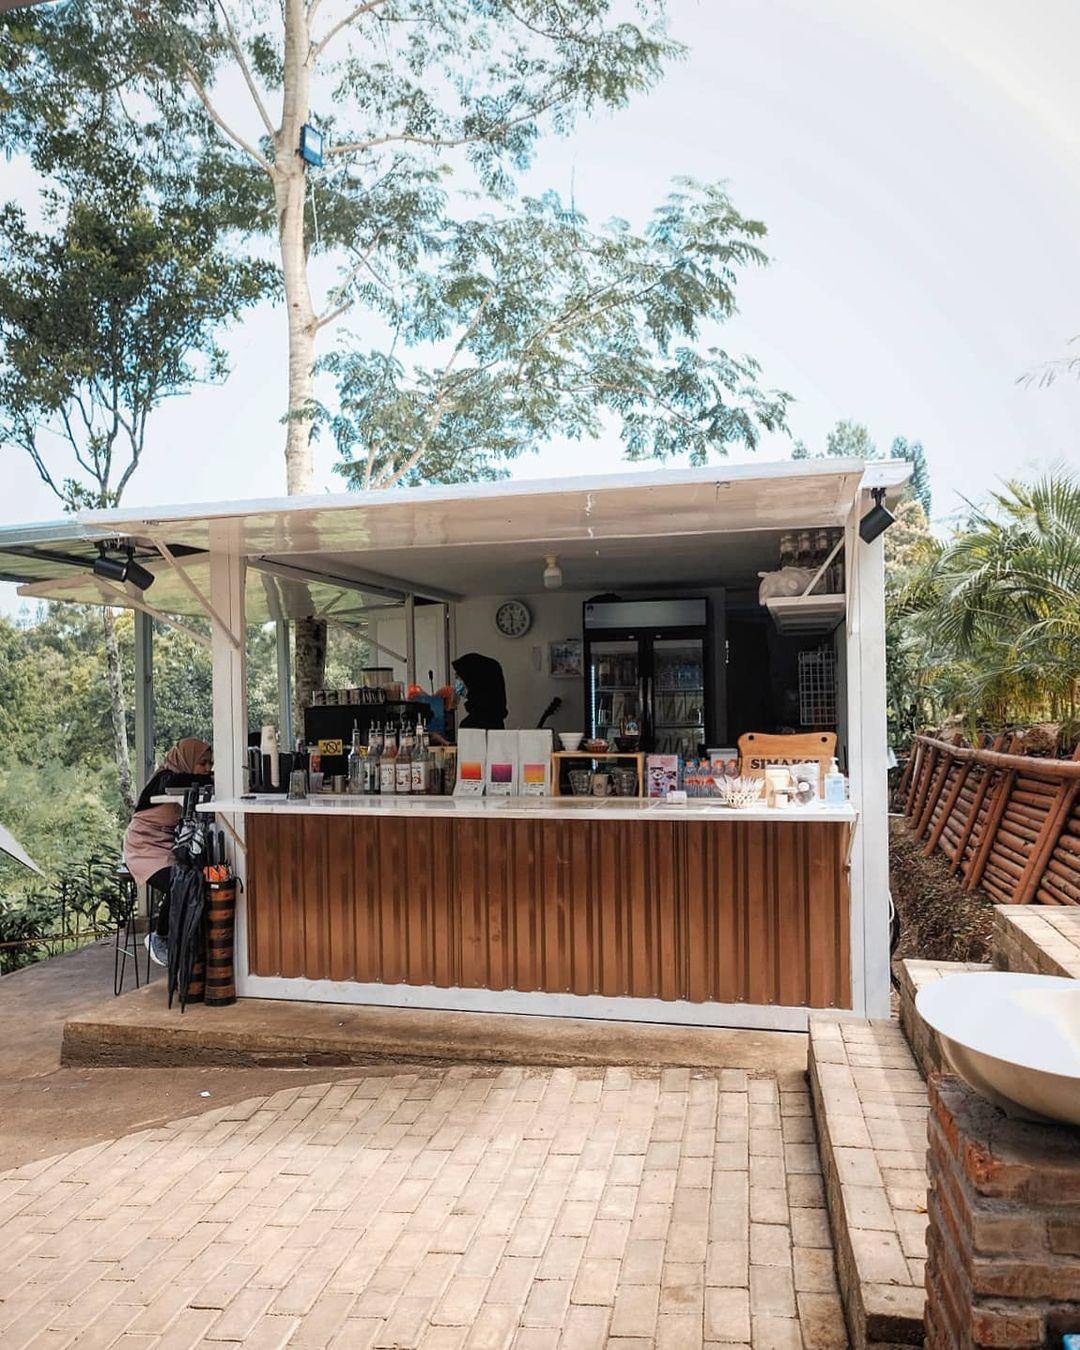 Tempat Memesan Menu Di Atanapi Coffee Camp Image From @gemarngopi